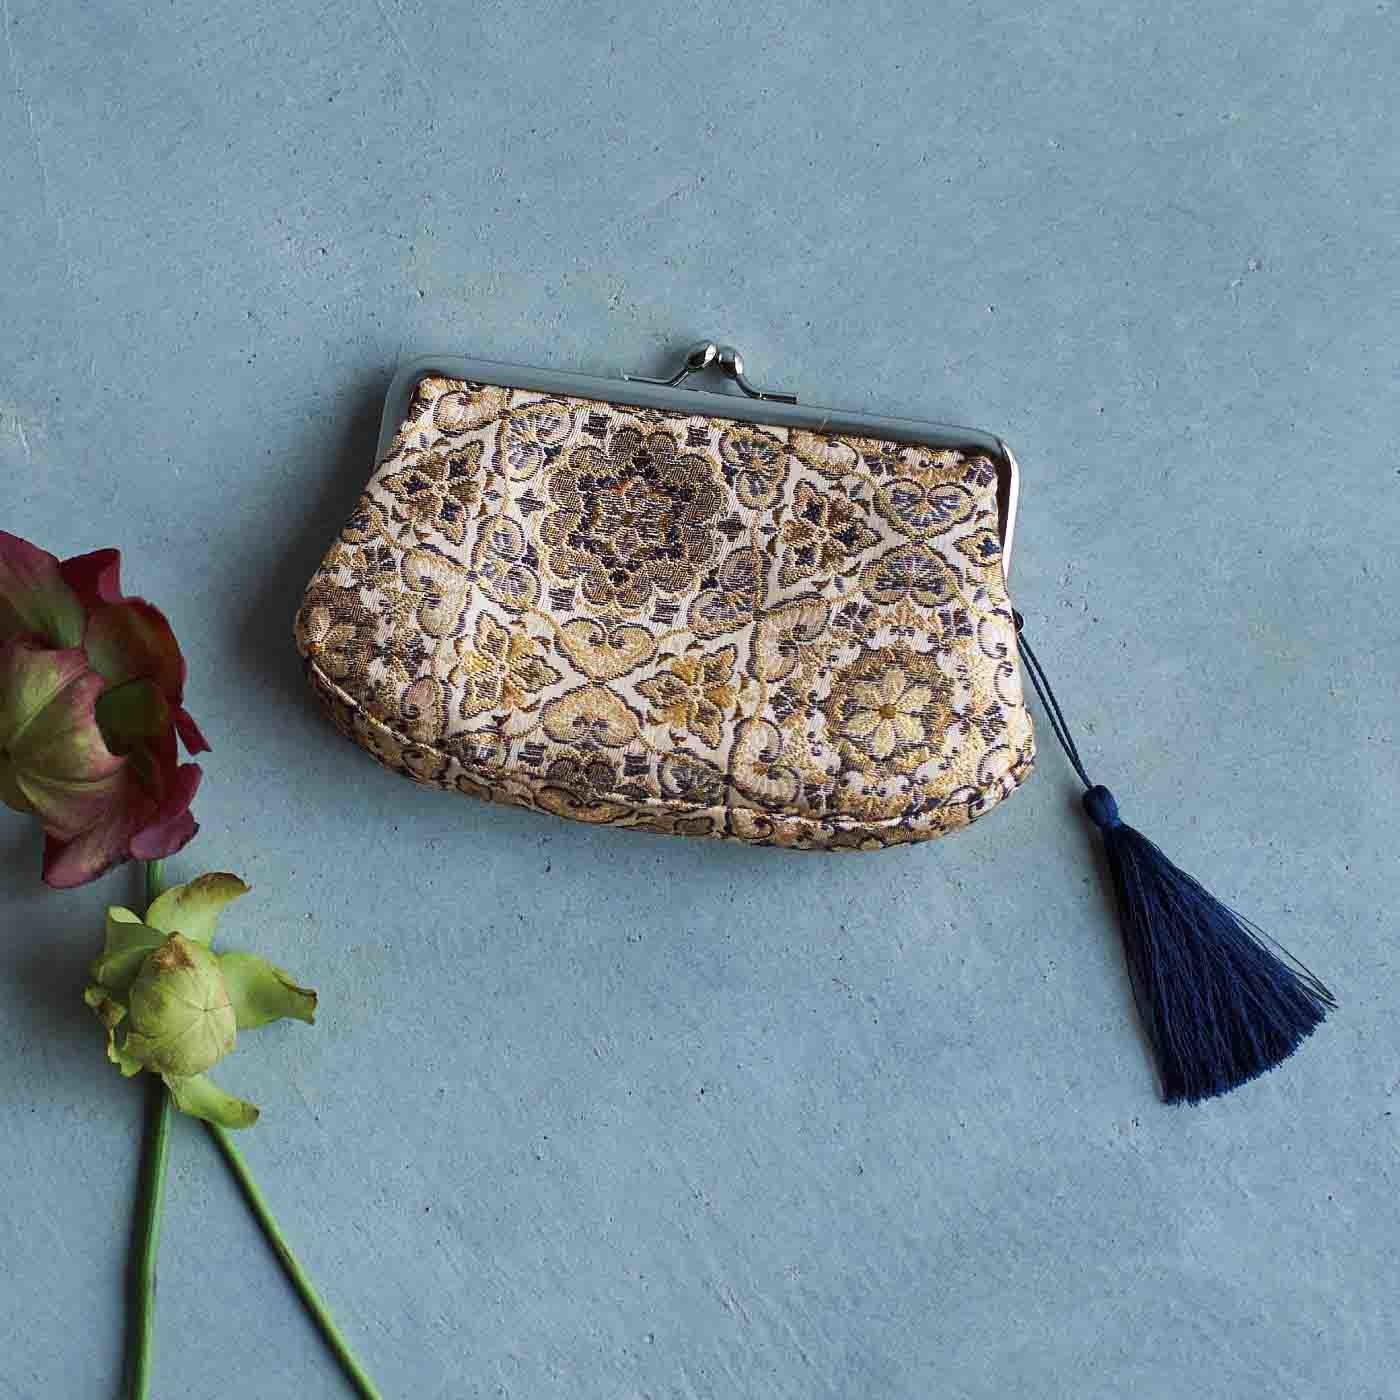 el:ment 京都の織屋さんで仕立てた 優雅なシルク糸遣いの京織(R)じゃばらがま口財布〈六角花柄〉